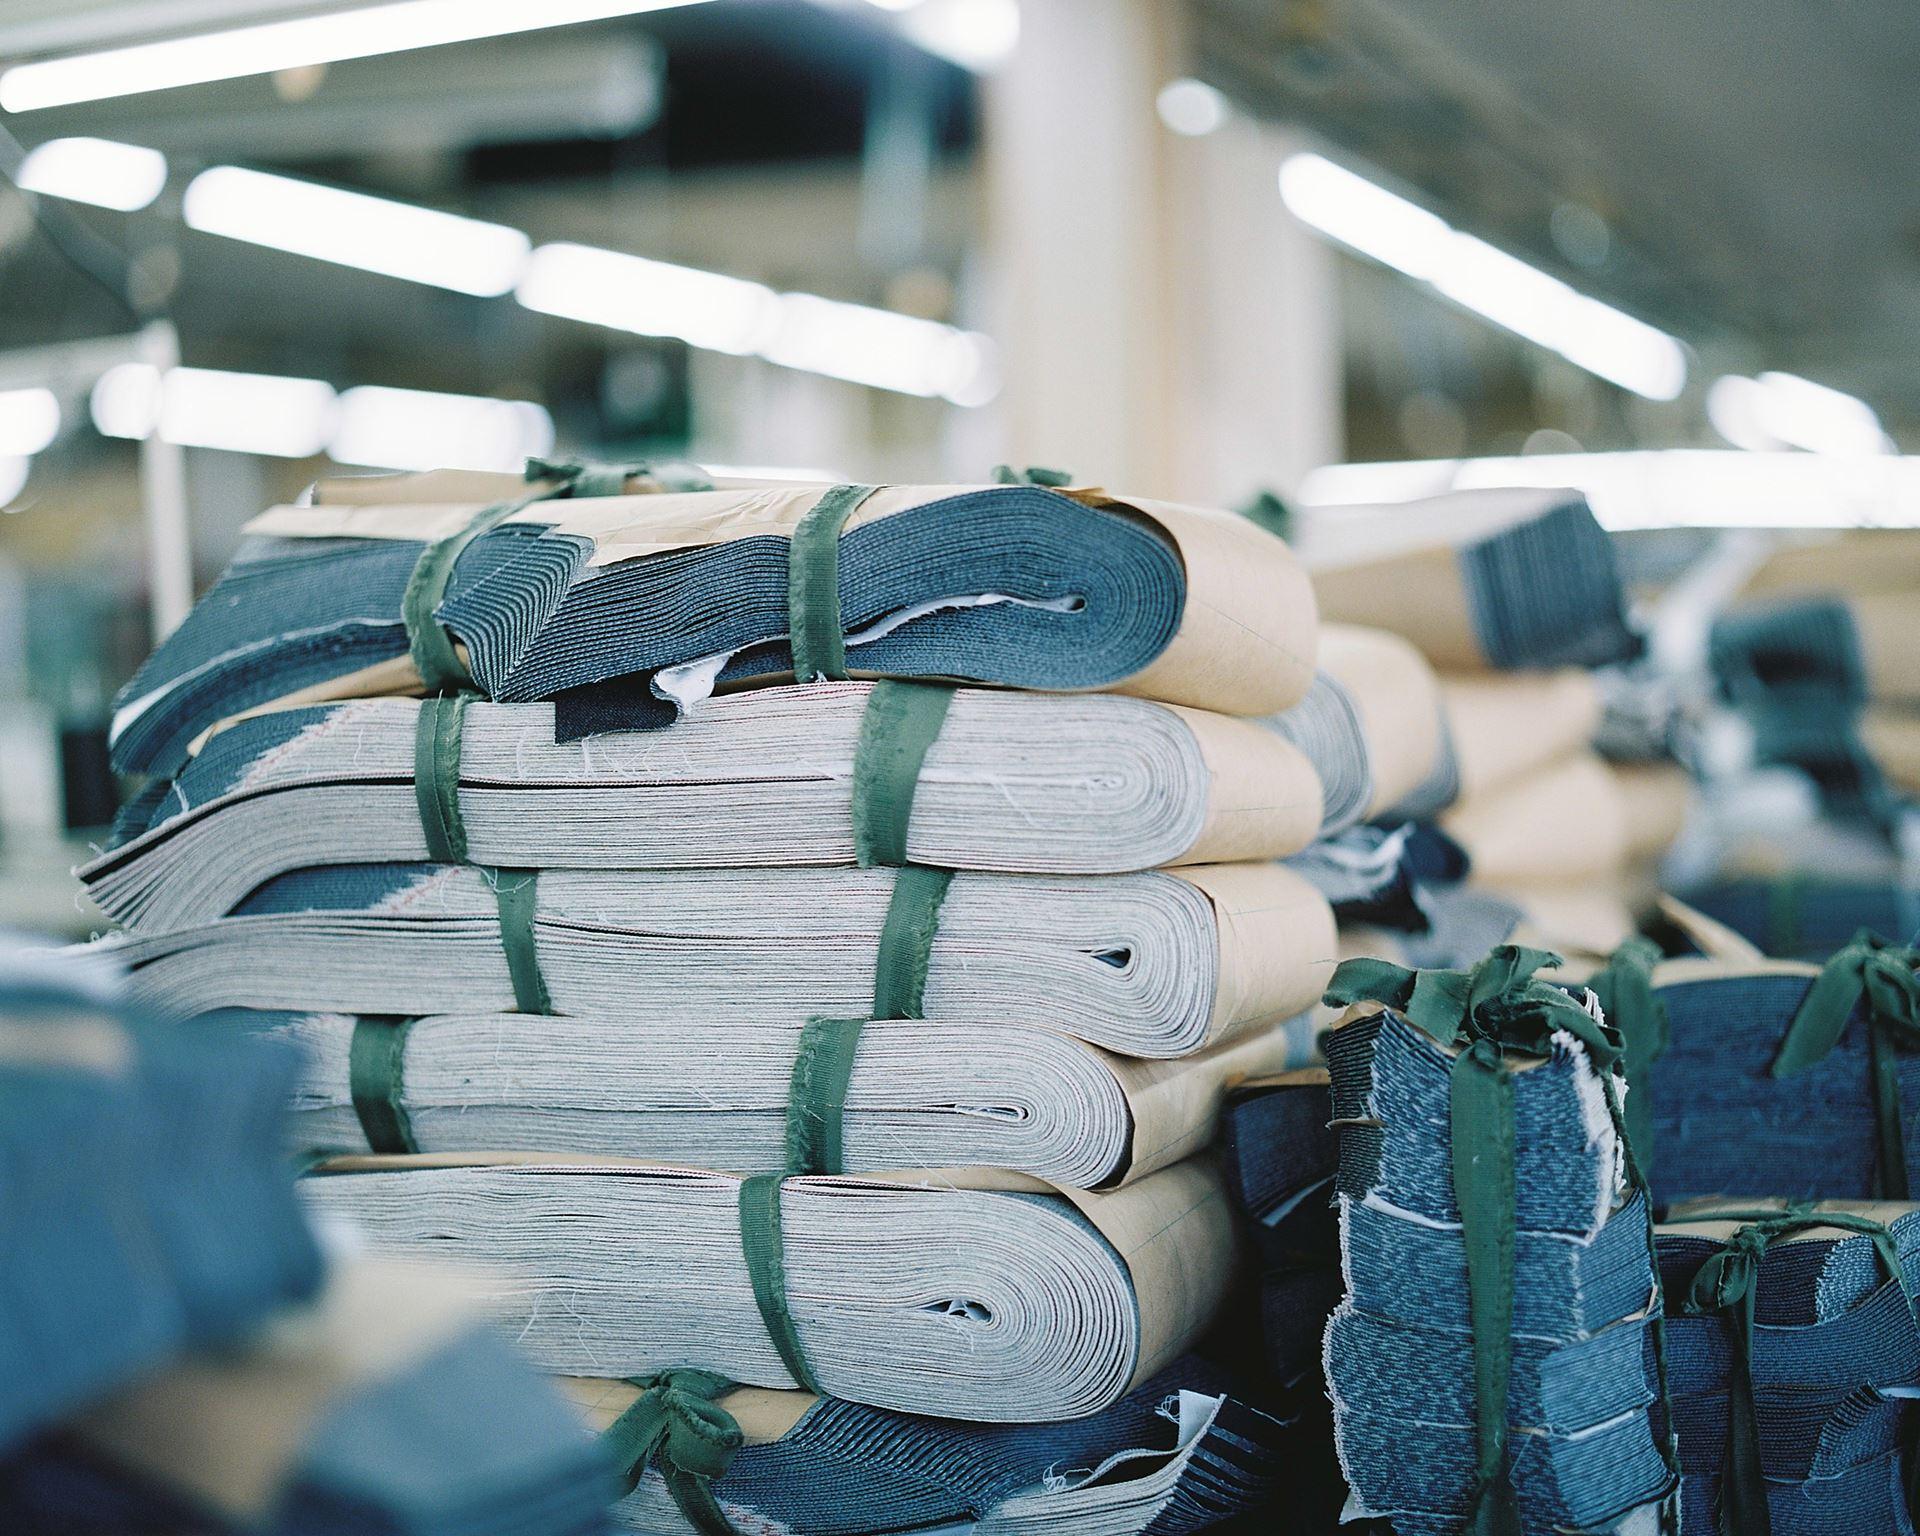 【NEWS】CIAOPANIC×僕らが纏うモノ ジーンズ縫製させて頂きました